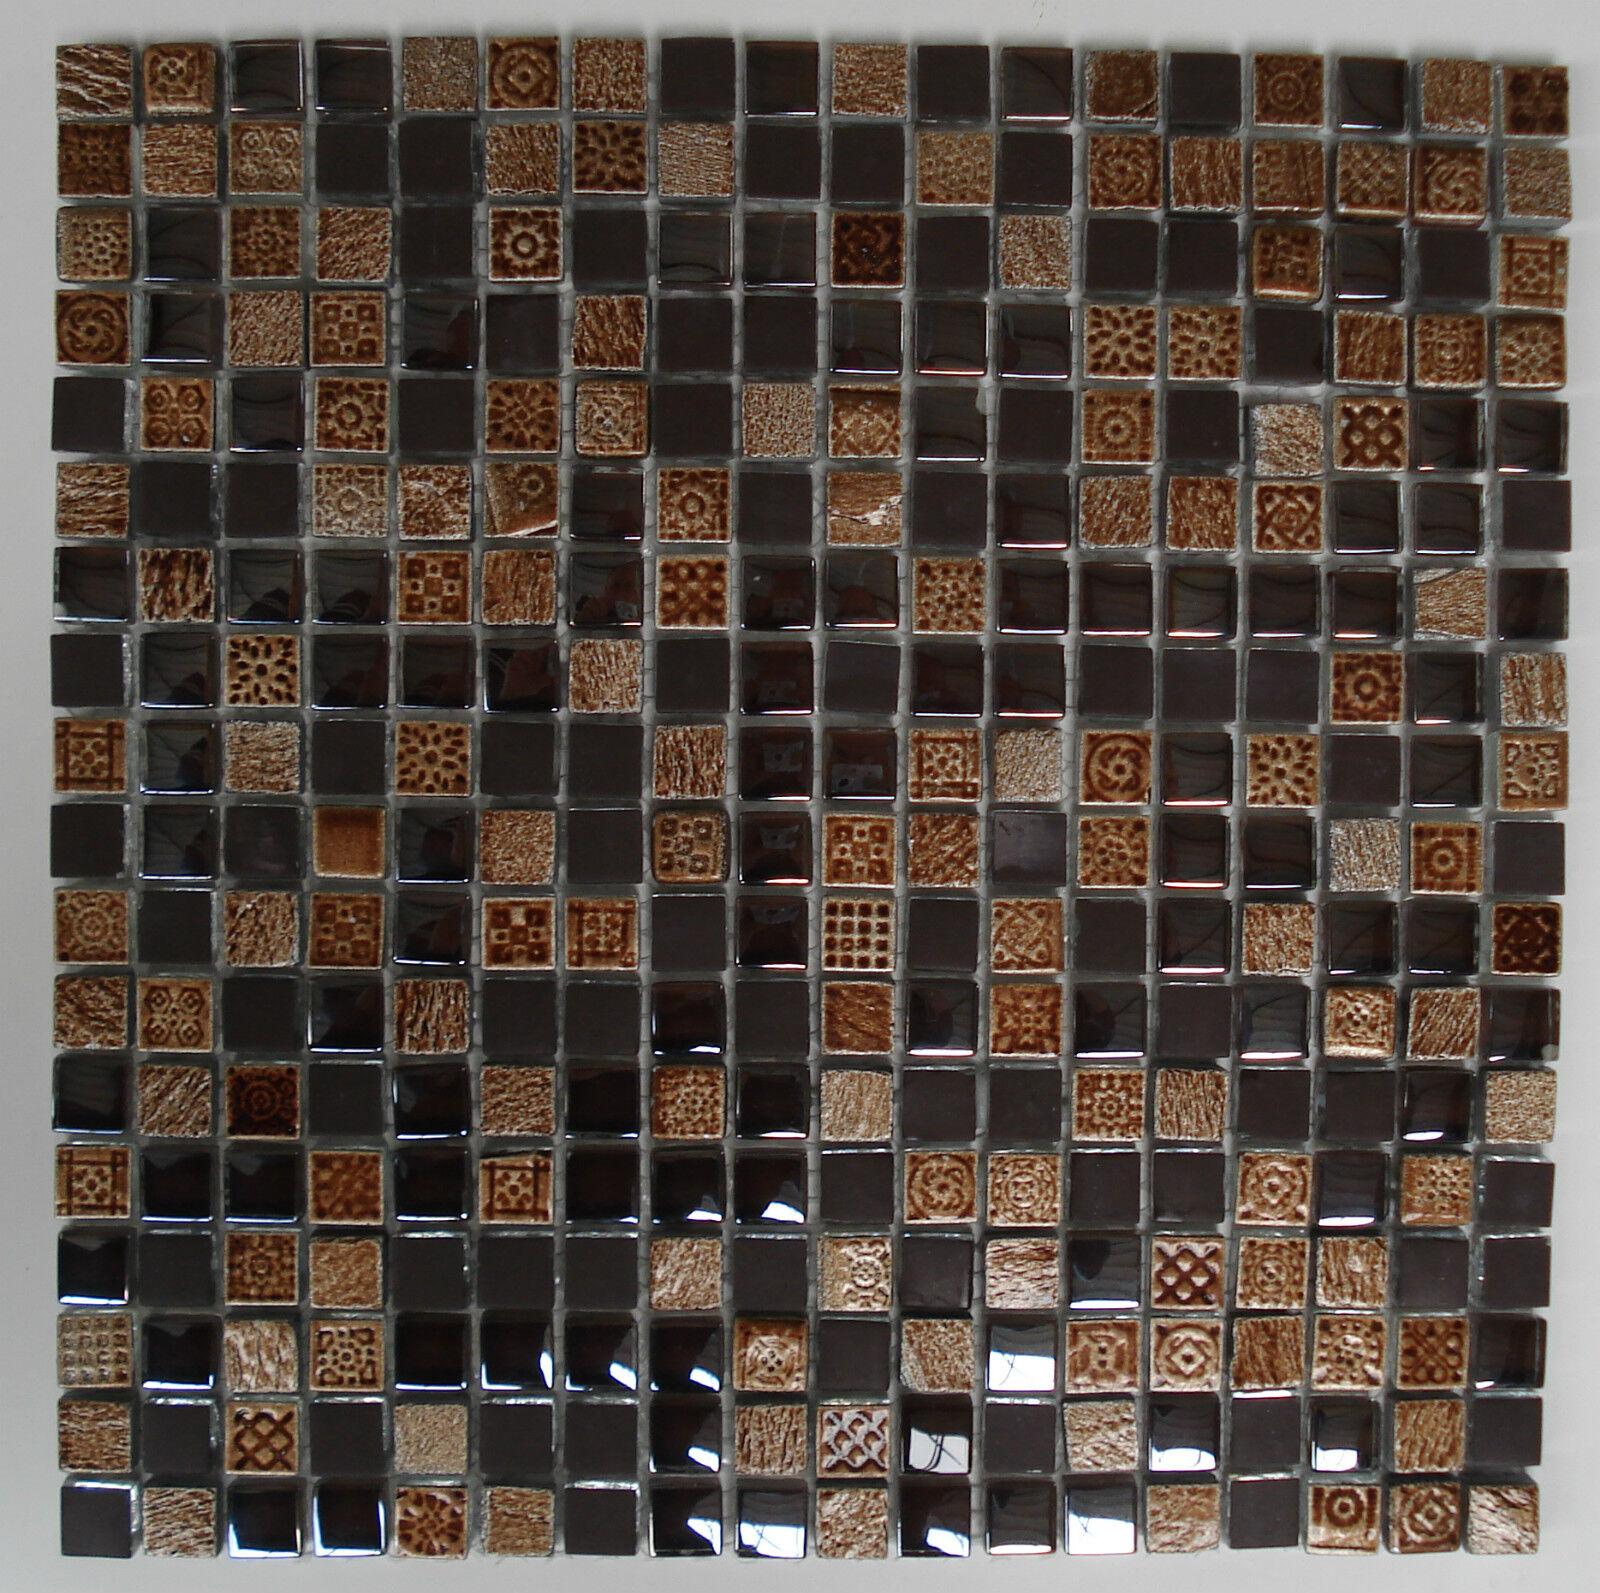 1qm Glas Keramik Mosaik Fliese braun Ornamente 30x30x0,8cm; 1,5x1,5cm Bad Küche